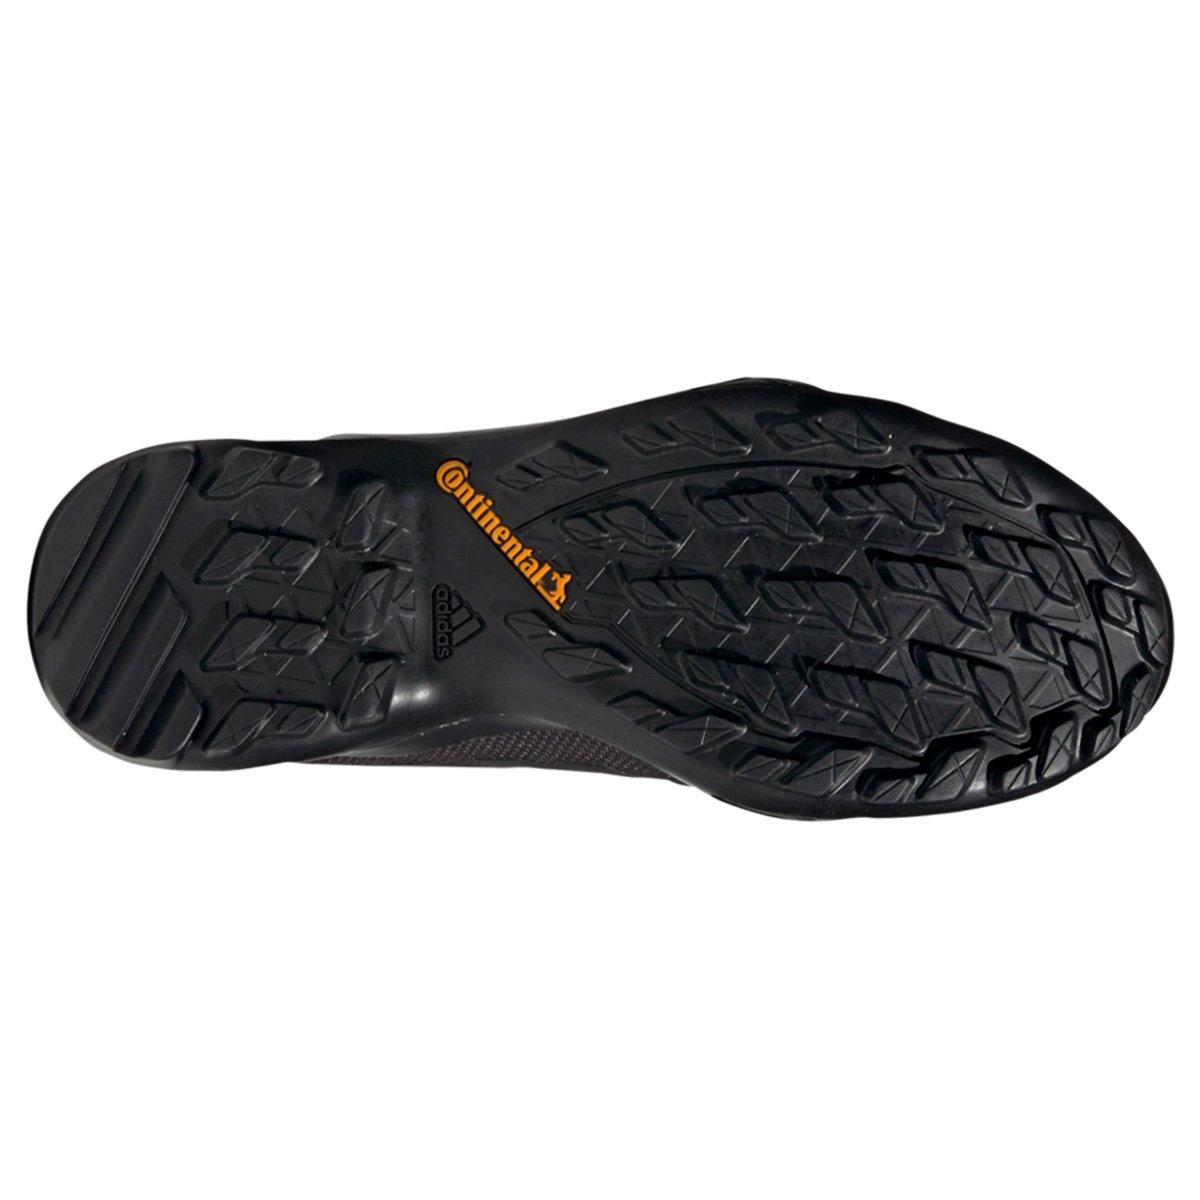 Tênis Adidas Terrex Ax3